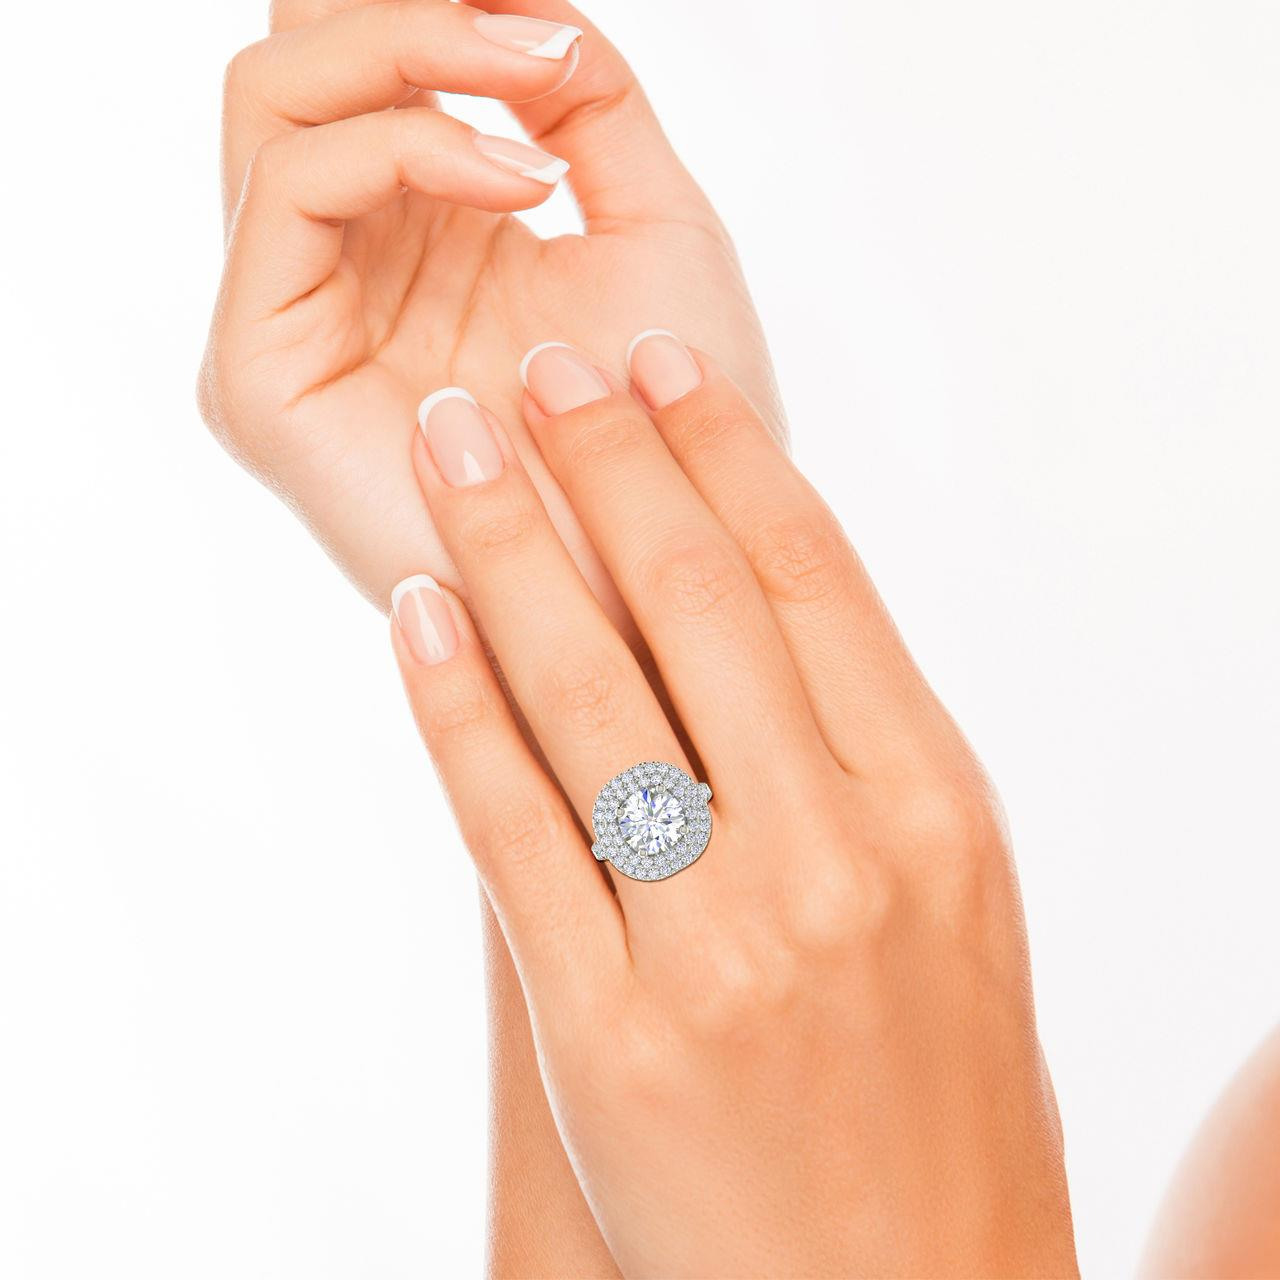 Double Halo 1.25 Carat Round Cut Diamond Engagement Ring